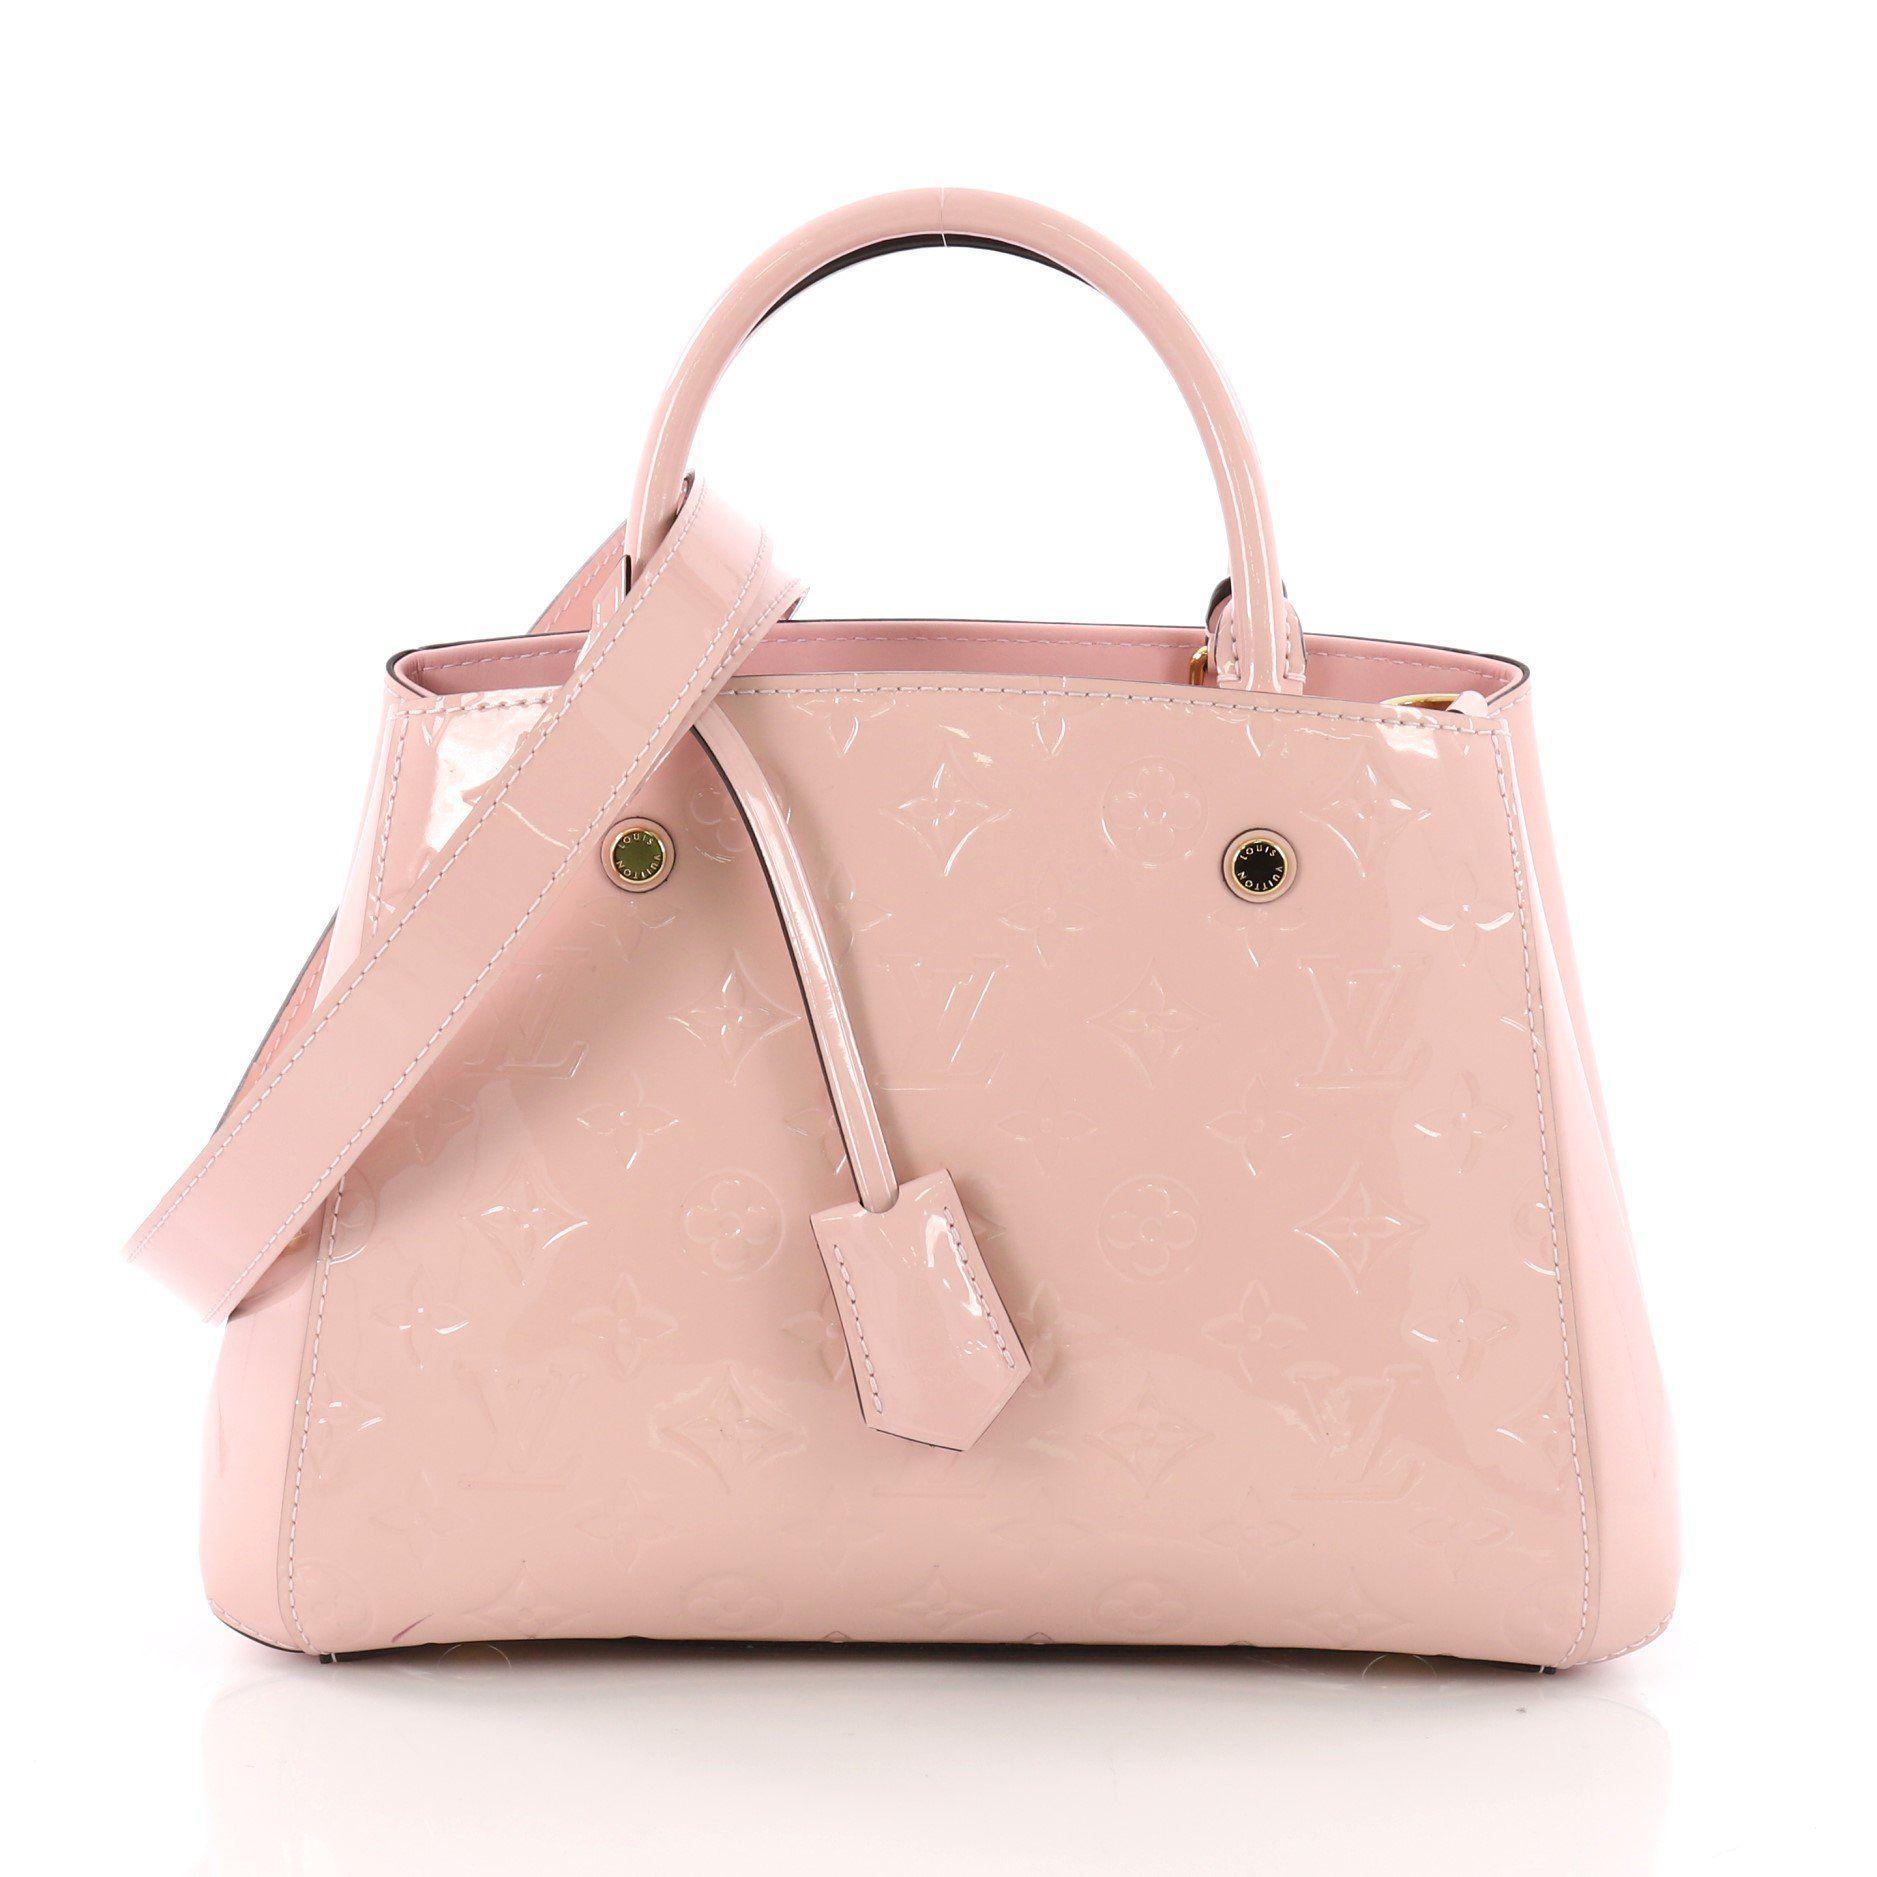 763f85a073f5 Louis Vuitton. Women s Pink Pre Owned Montaigne Handbag Monogram Vernis Bb